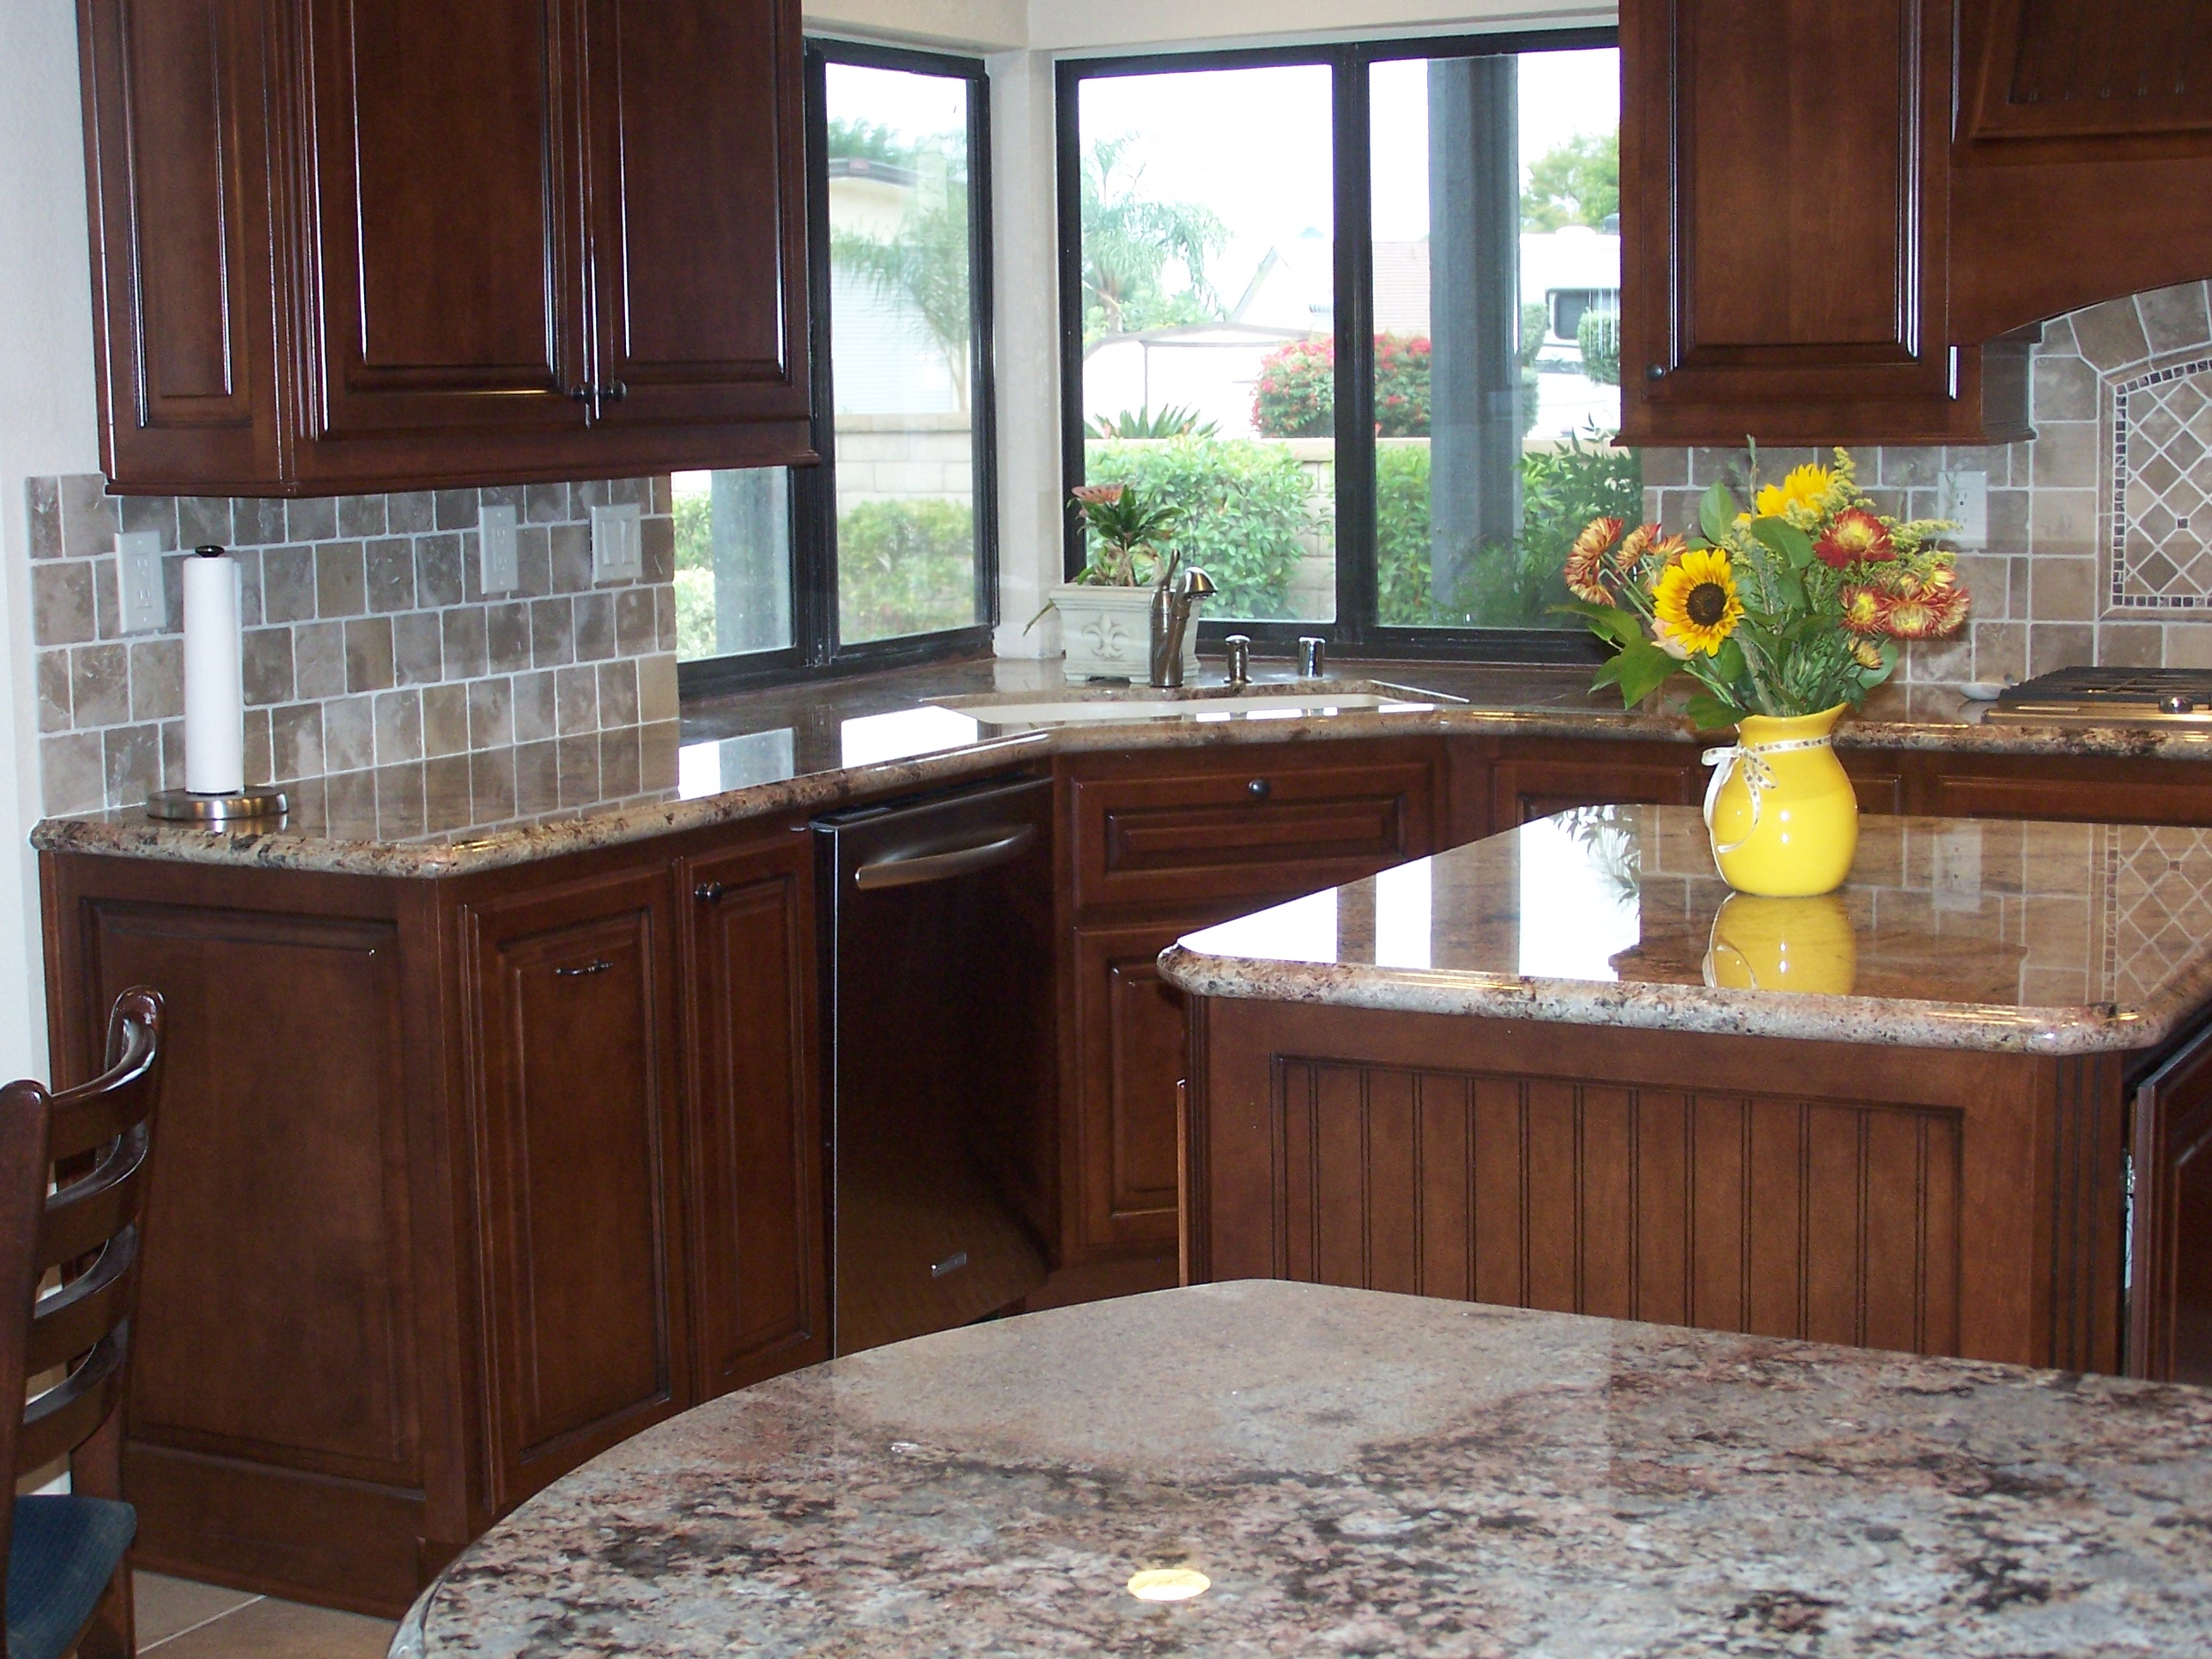 Custom kitchen cabinets c l design specialists inc for Custom kitchen cabinets design